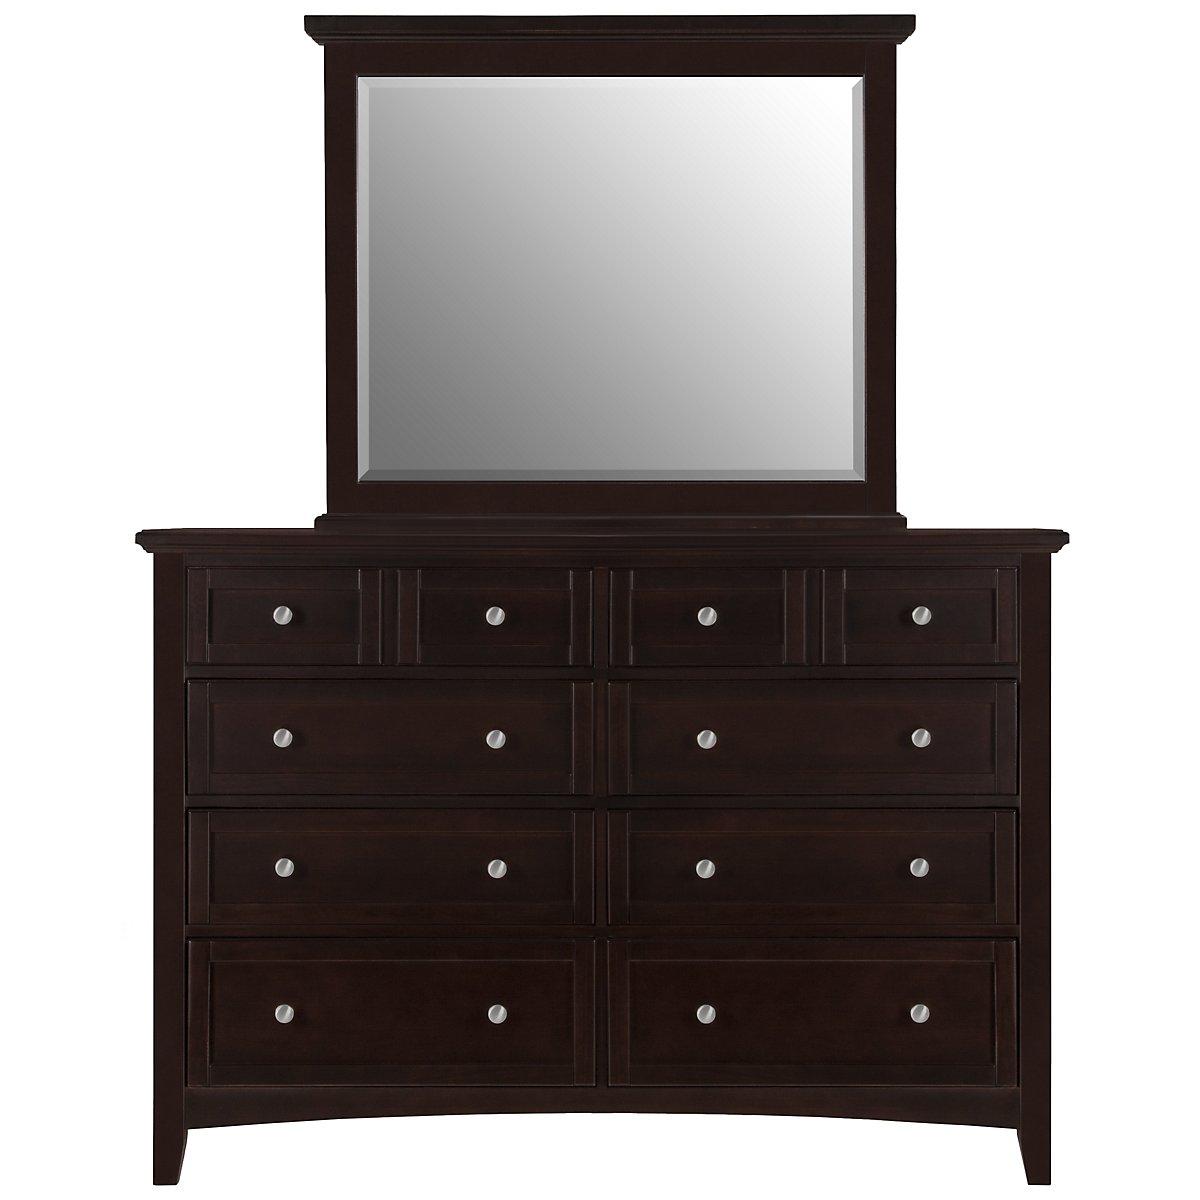 Captiva Dark Tone Large Dresser & Mirror